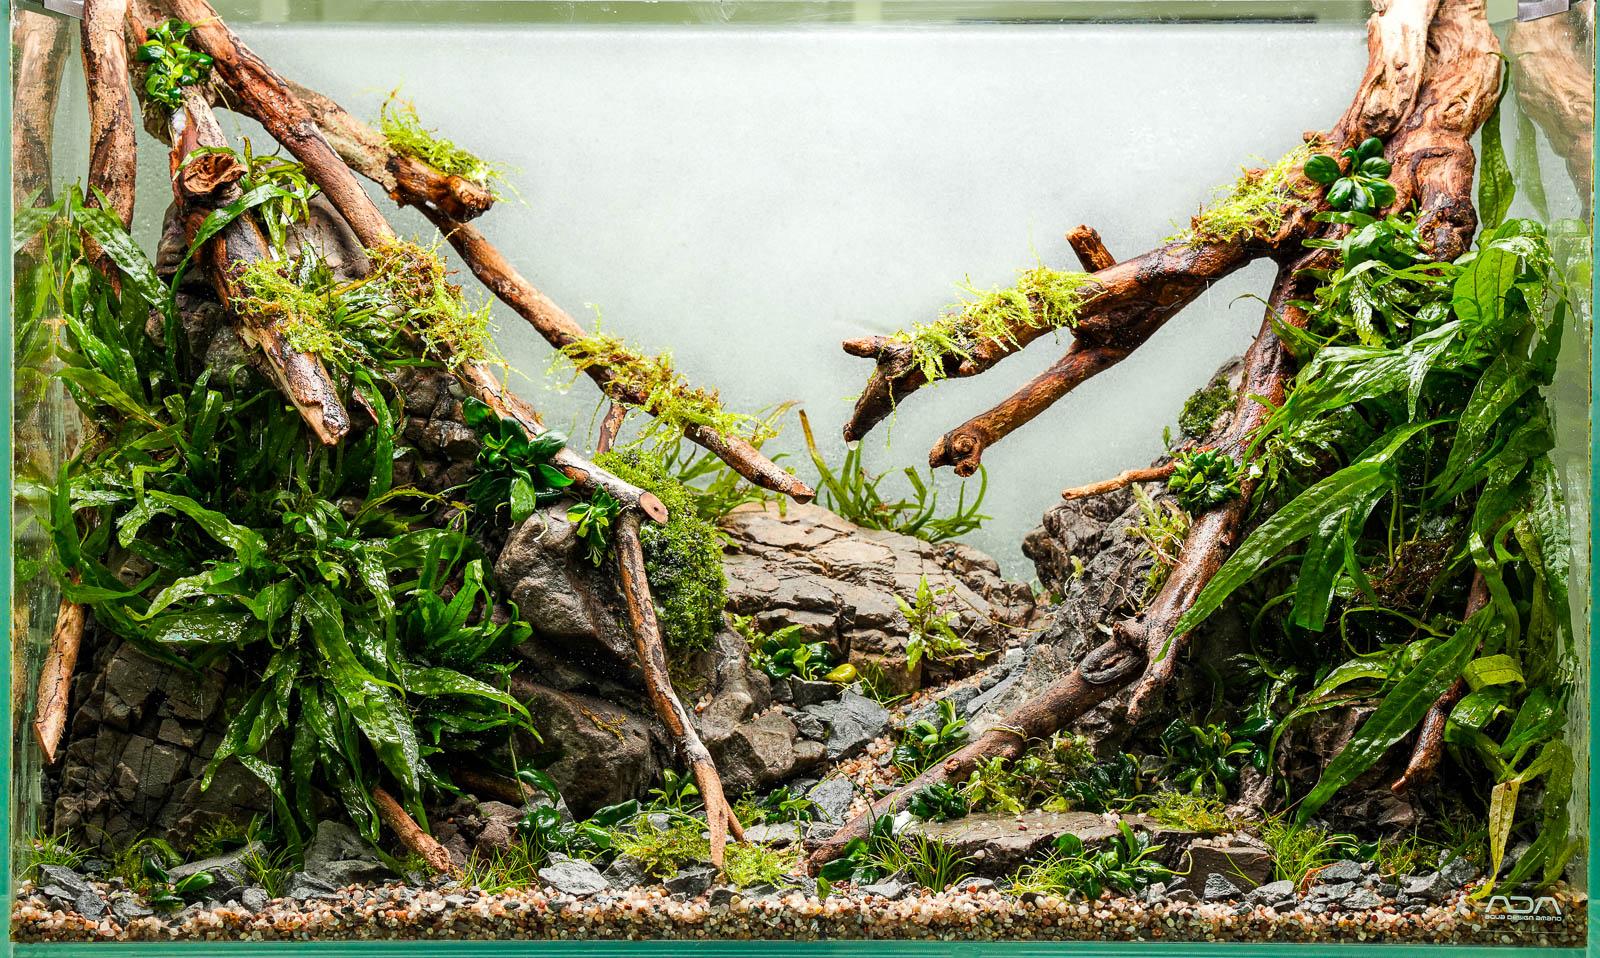 Talawa Wood Biotope Aquascape - Talawa Holz Biotop Aquascape